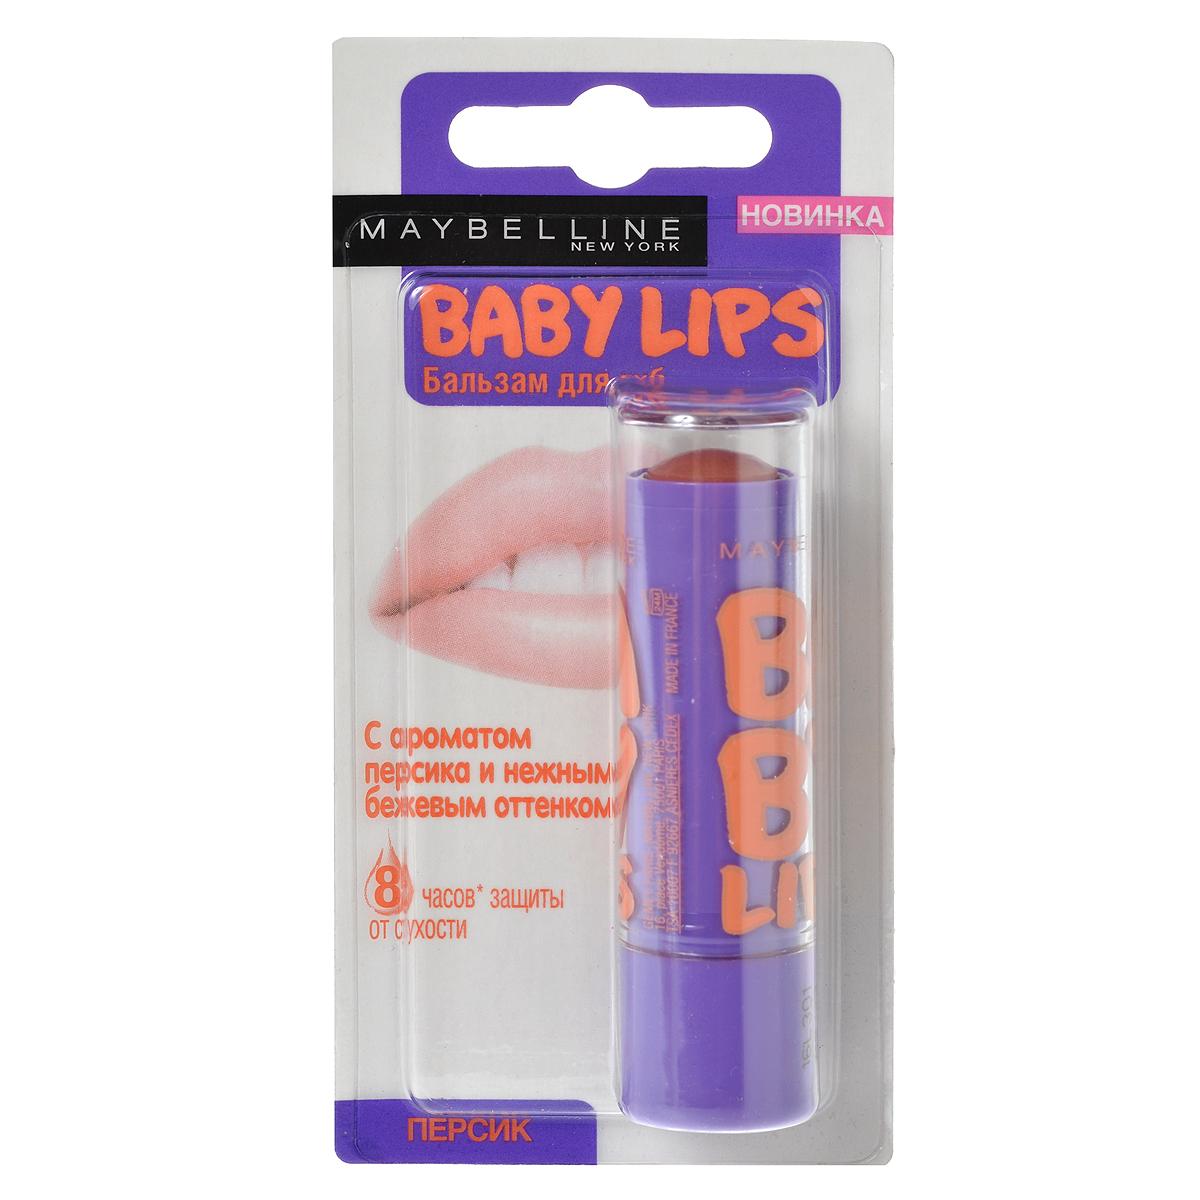 Maybelline New York Бальзам для губ Baby Lips, Персик, восстанавливающий и увлажняющий, с бежевым оттенком и запахом, 1,78 мл